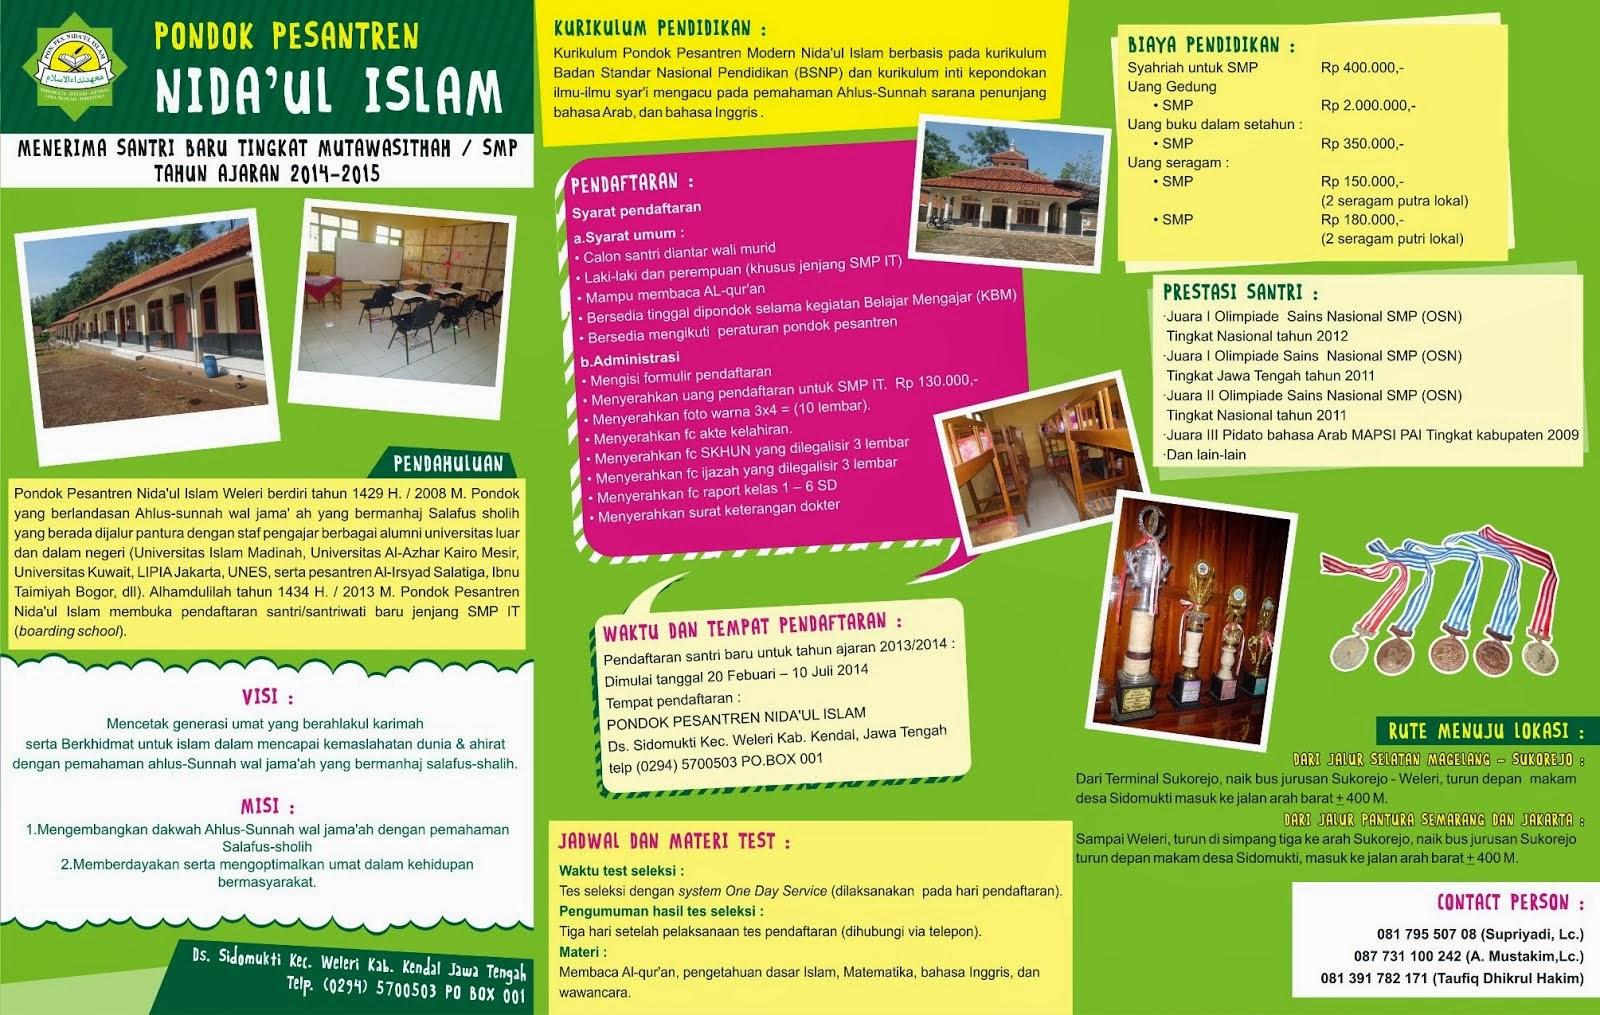 Penerimaan Santri Baru Tingkat SMP Ponpes Modern Nida'ul Islam Weleri - Kendal - Jateng